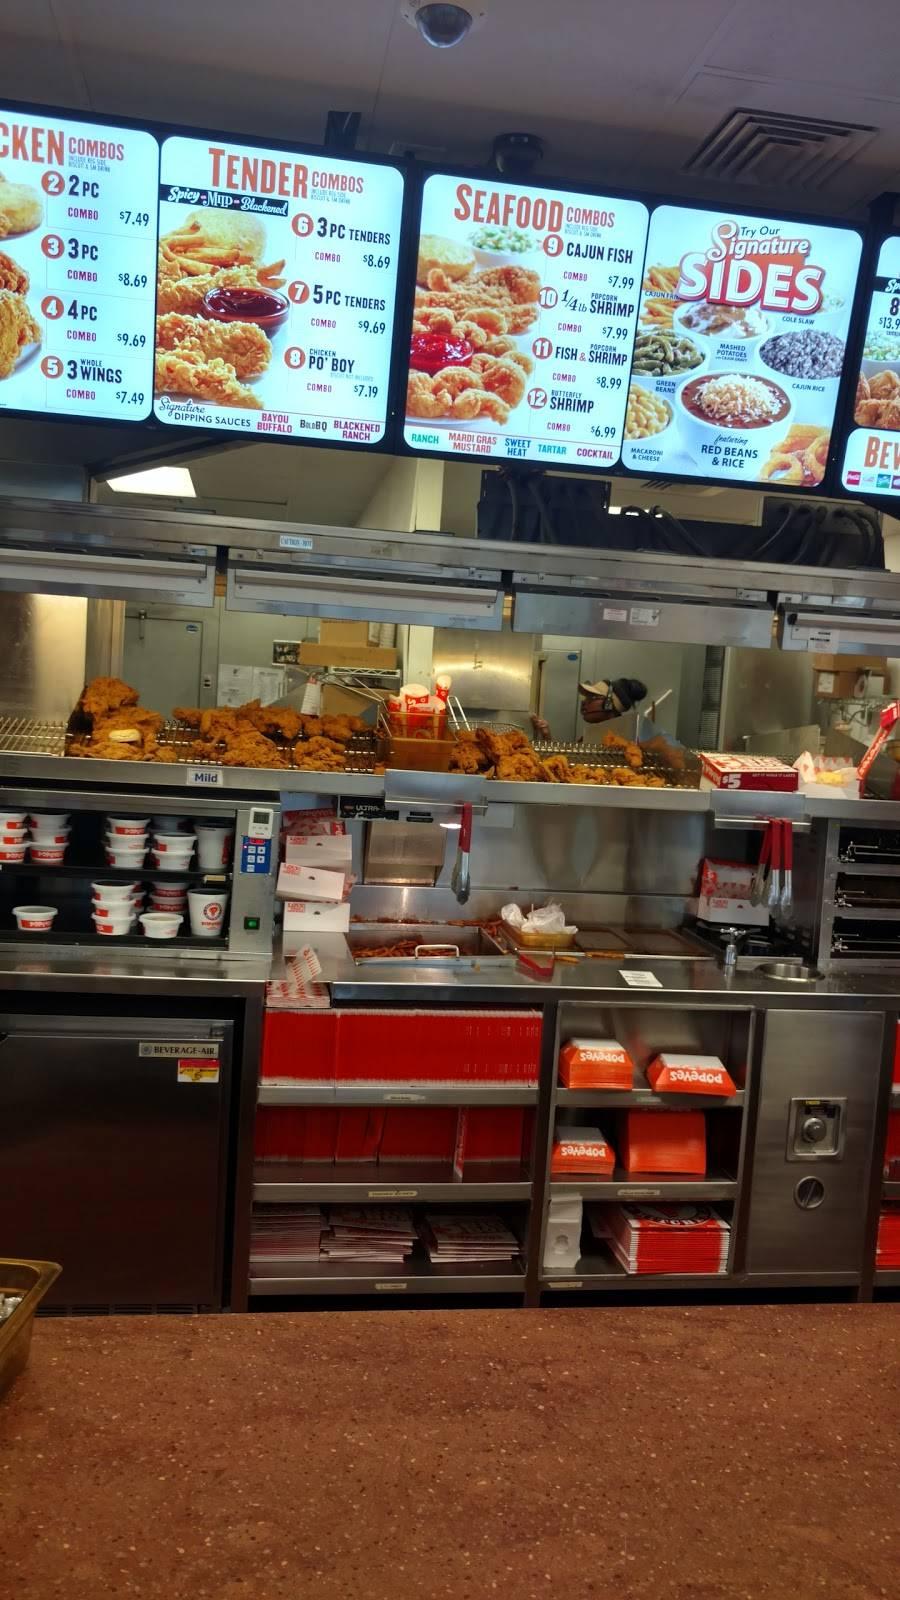 Popeyes Louisiana Kitchen   restaurant   275 N Delsea Dr, Vineland, NJ 08360, USA   8566920301 OR +1 856-692-0301